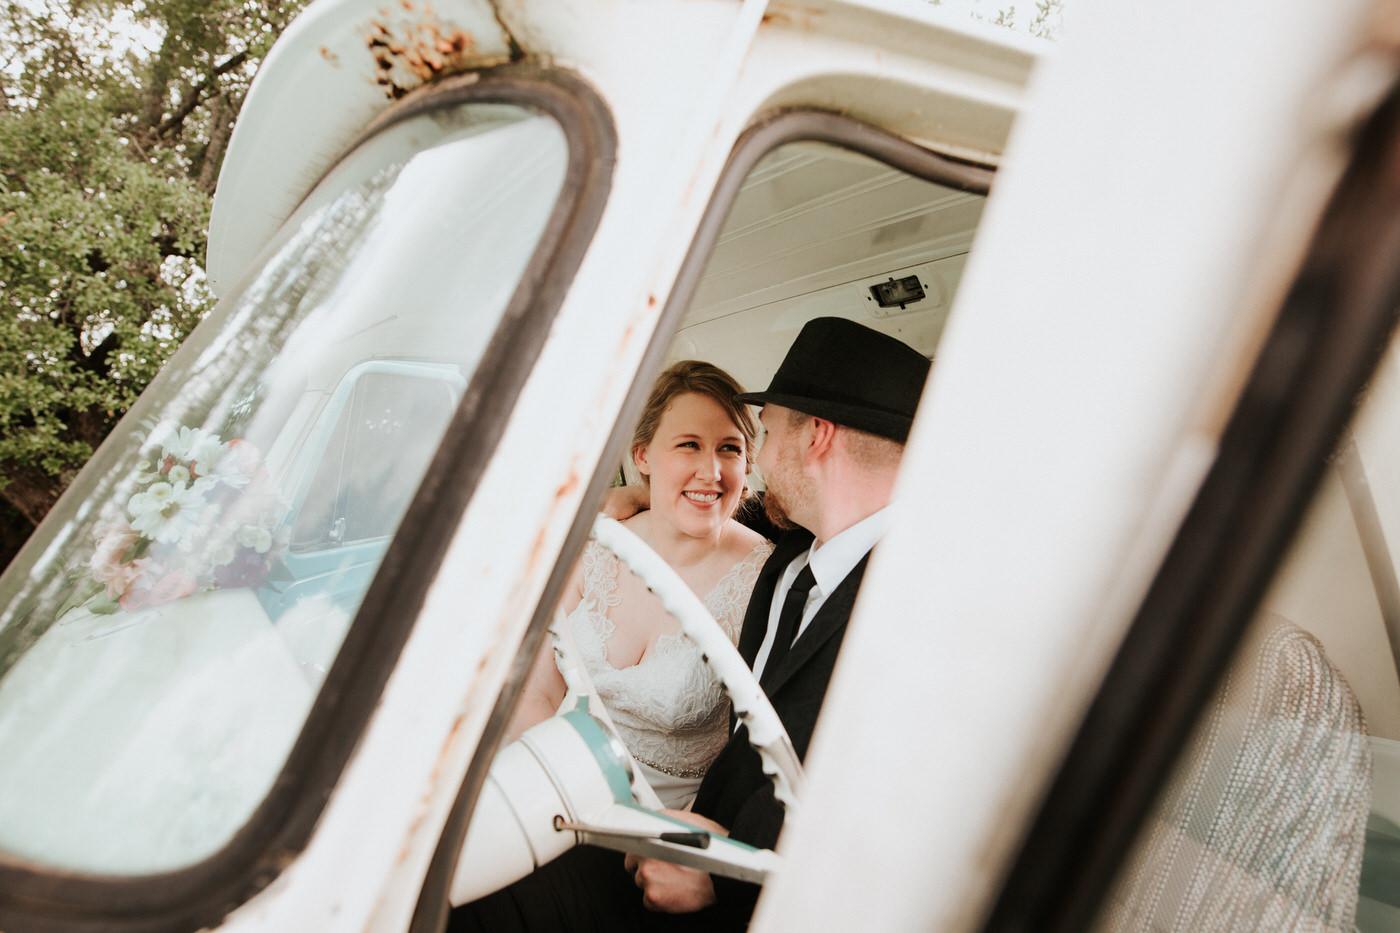 Chapel Dulcinea Elopement Wedding - Diana Ascarrunz Photography-368.jpg